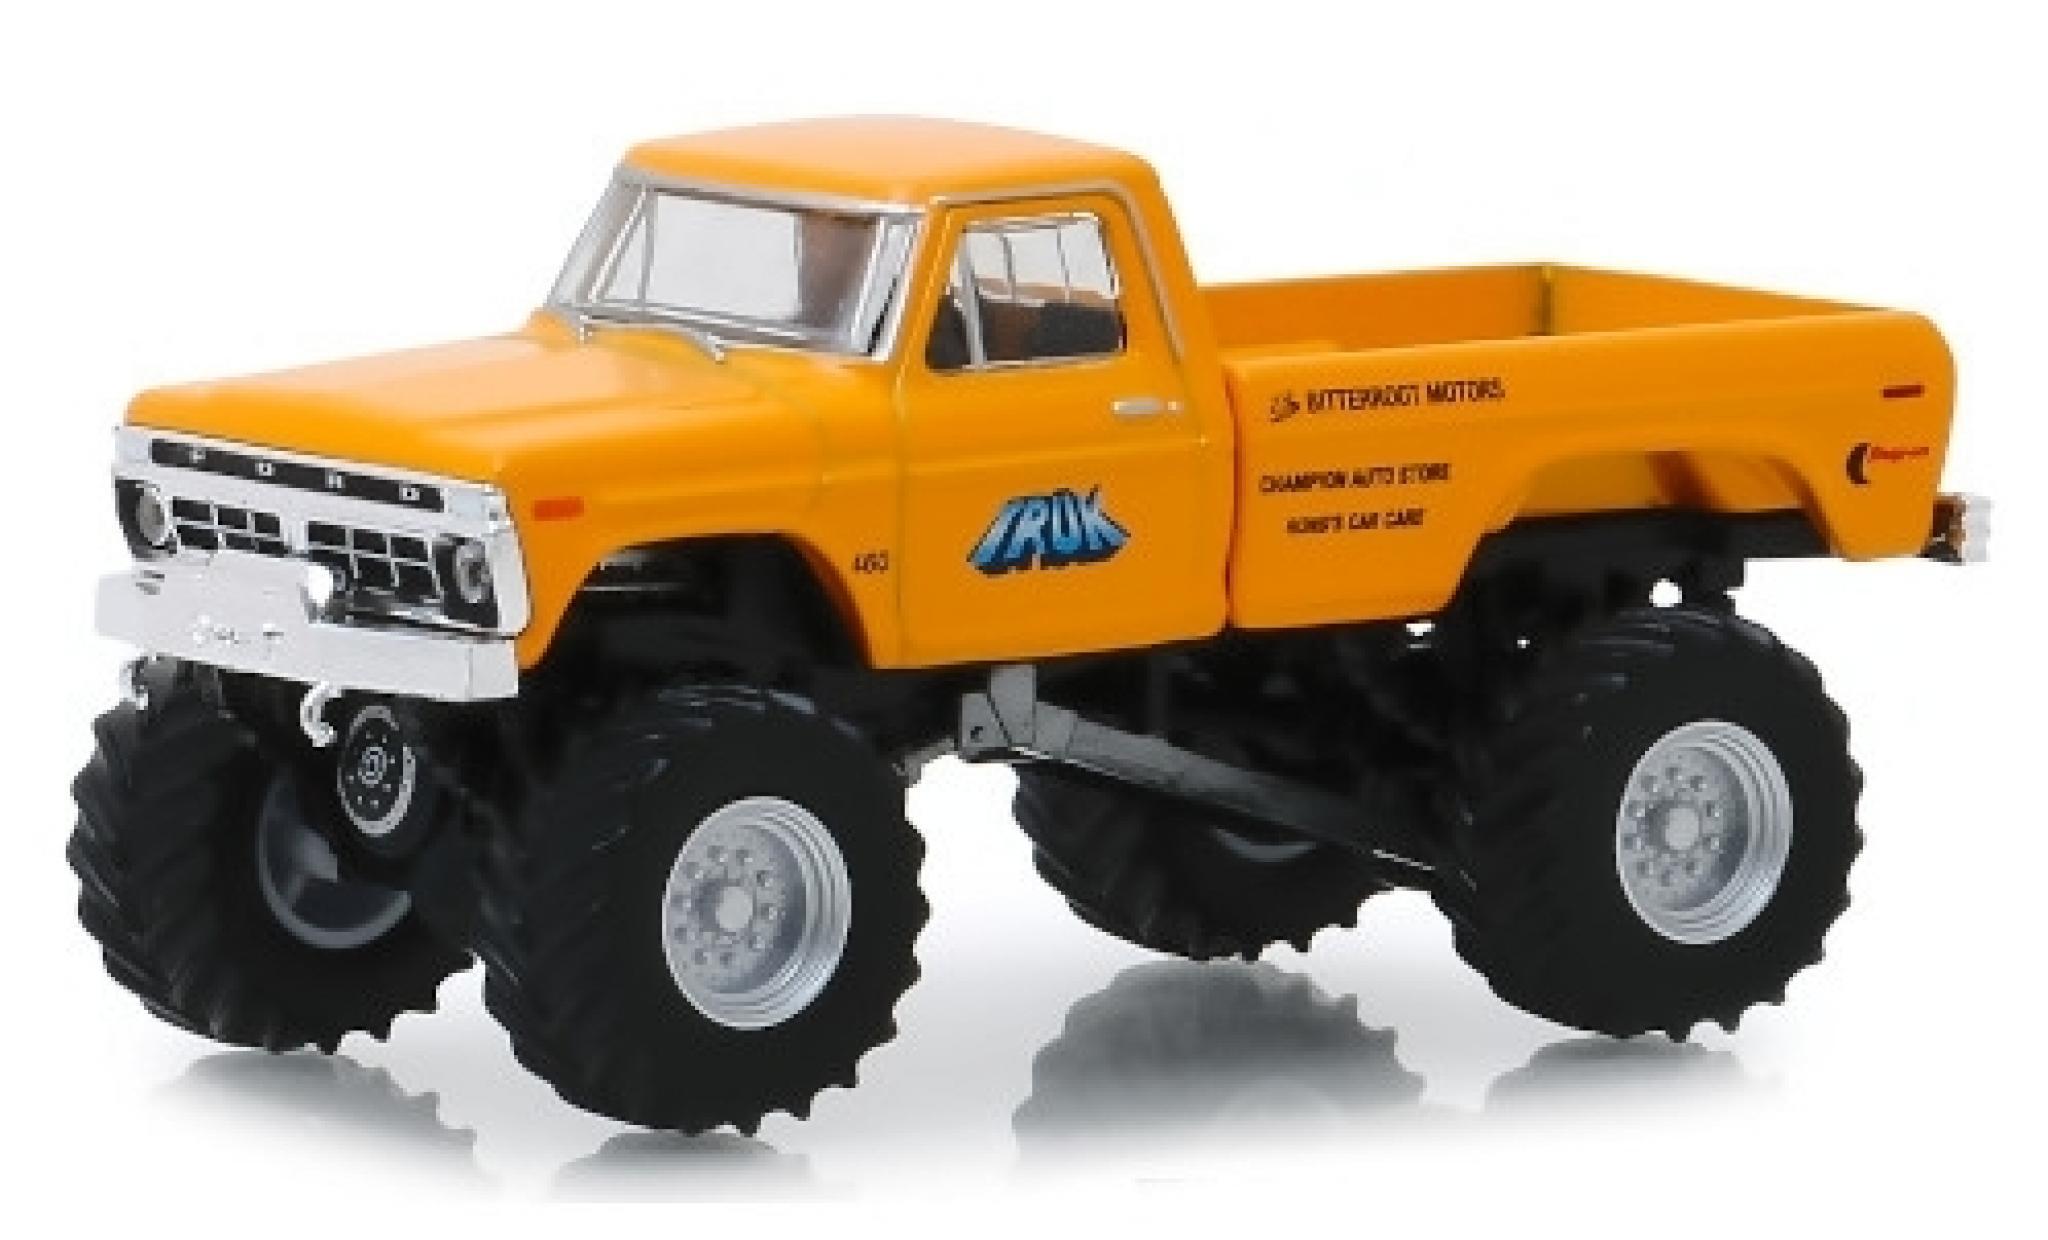 Ford F-250 1/64 Greenlight Monster Truck Truk 1977